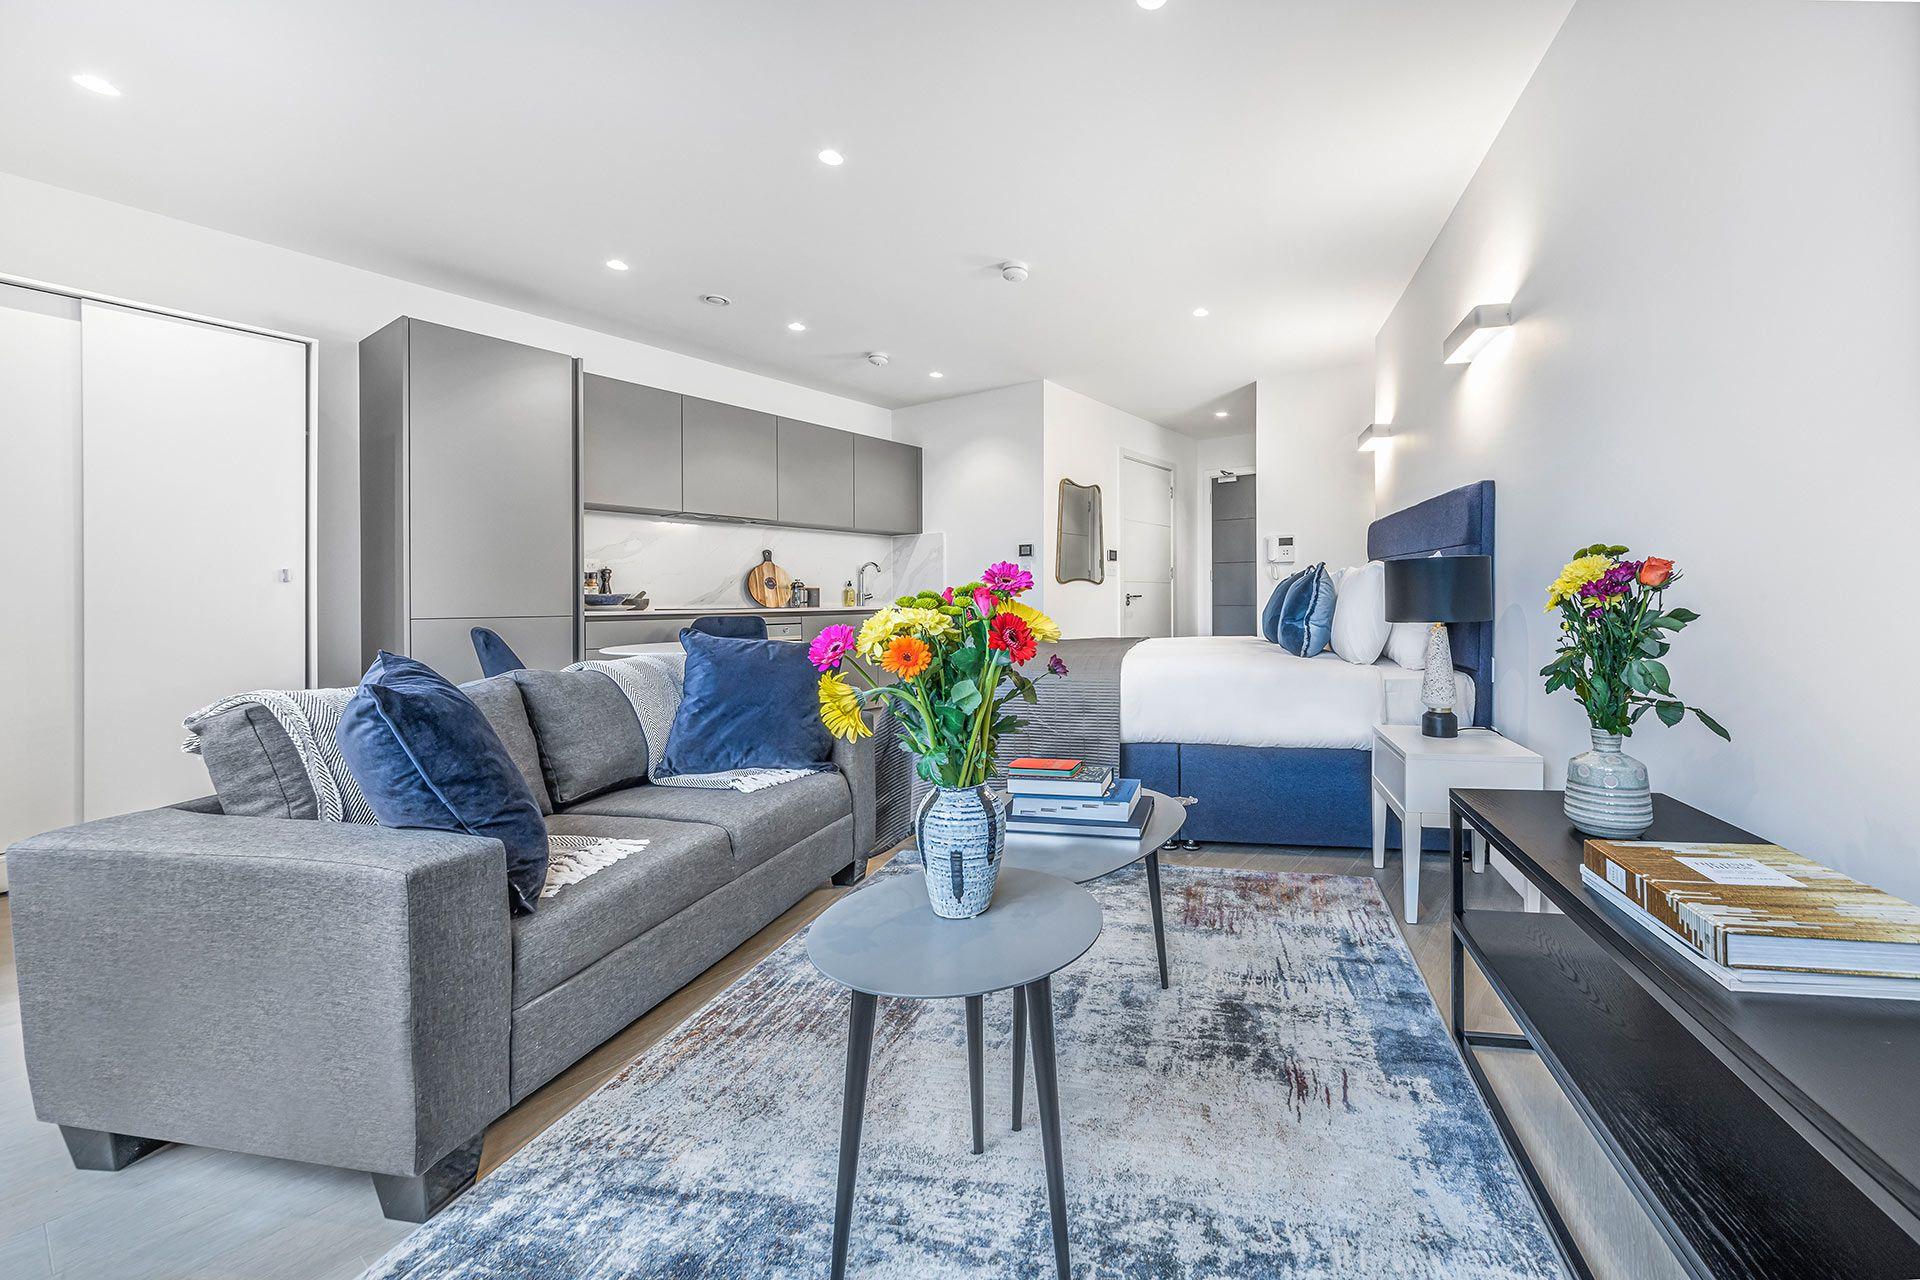 Studio apartment to rent in London SKI-FH-0045